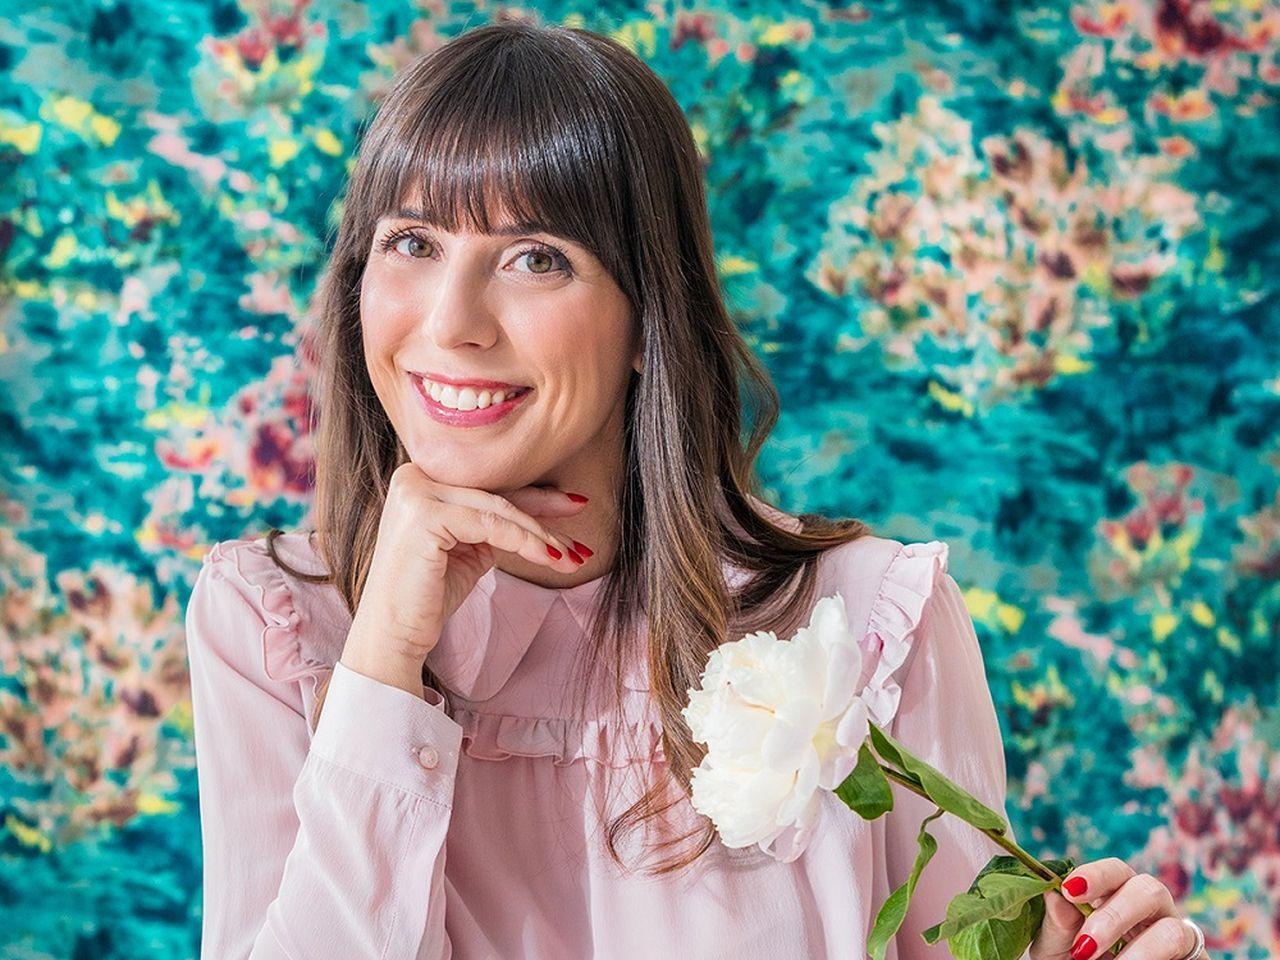 Viviana Grunert Vivi a fiori